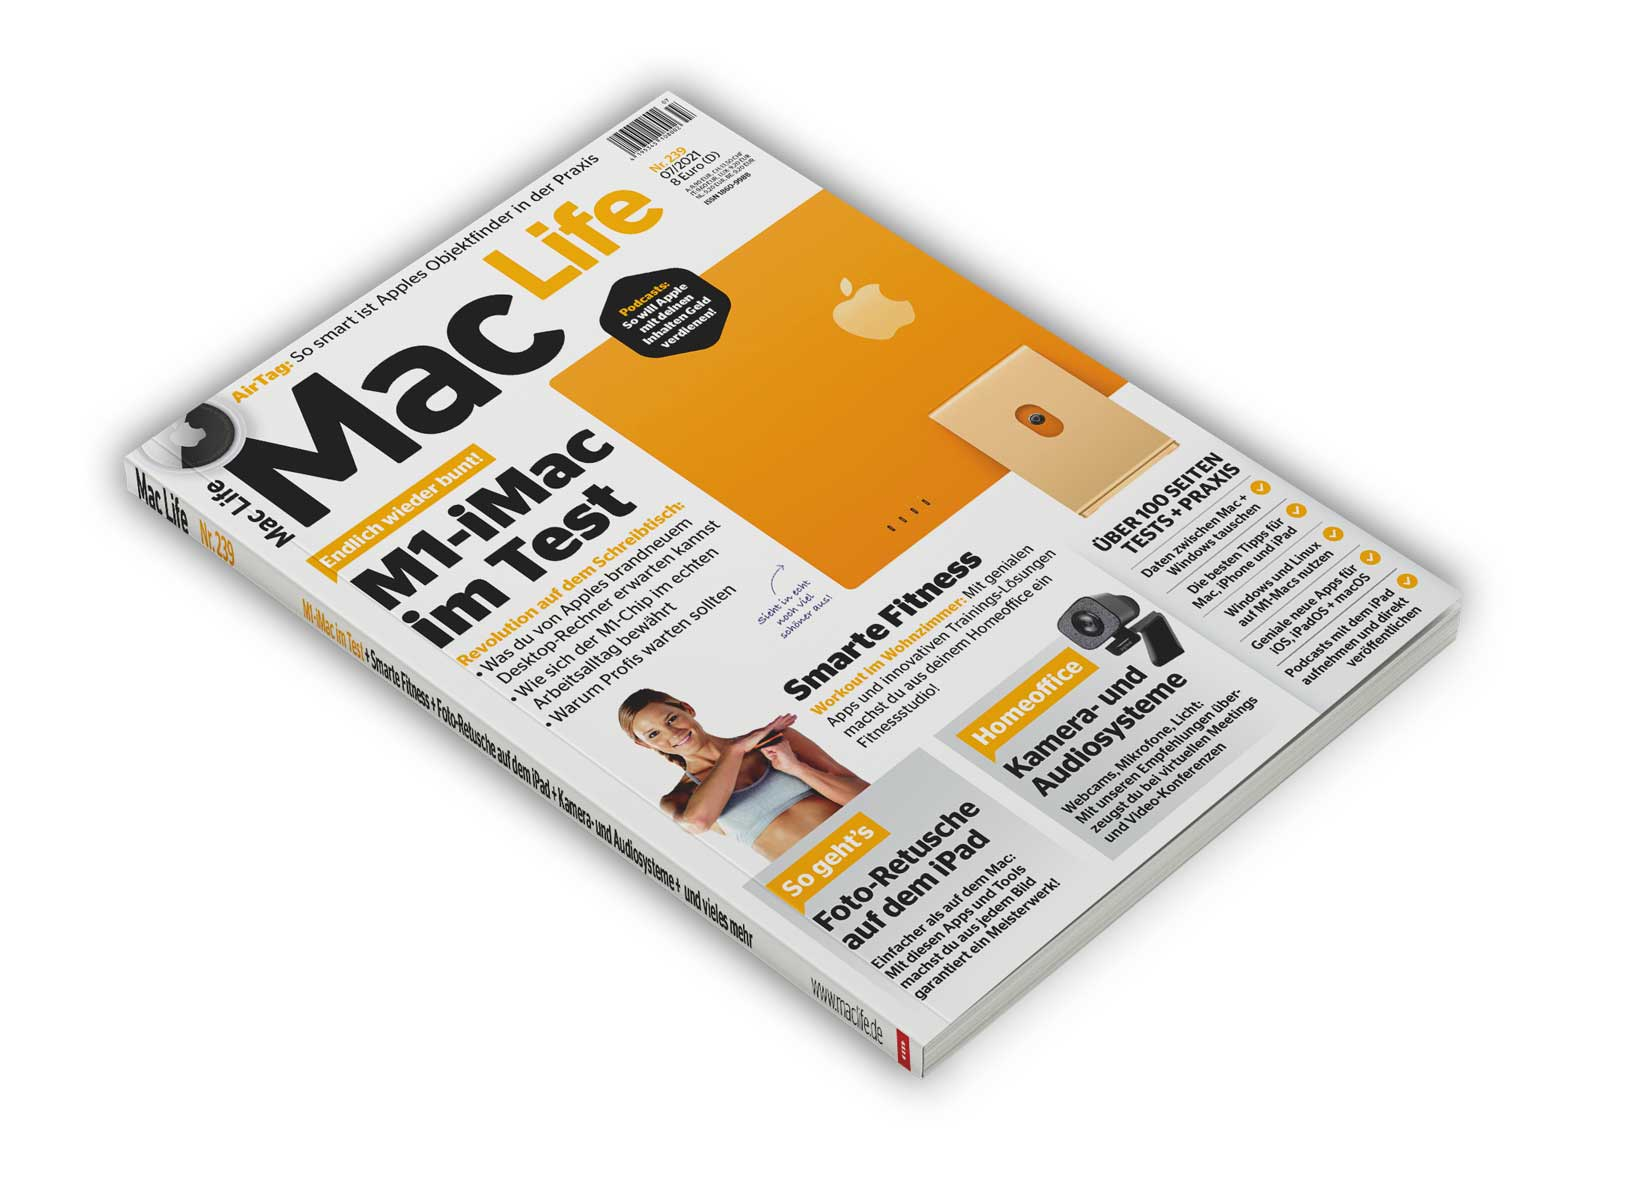 Mac Life 07/2021 → Jetzt bei falkemedia kaufen | falkemedia